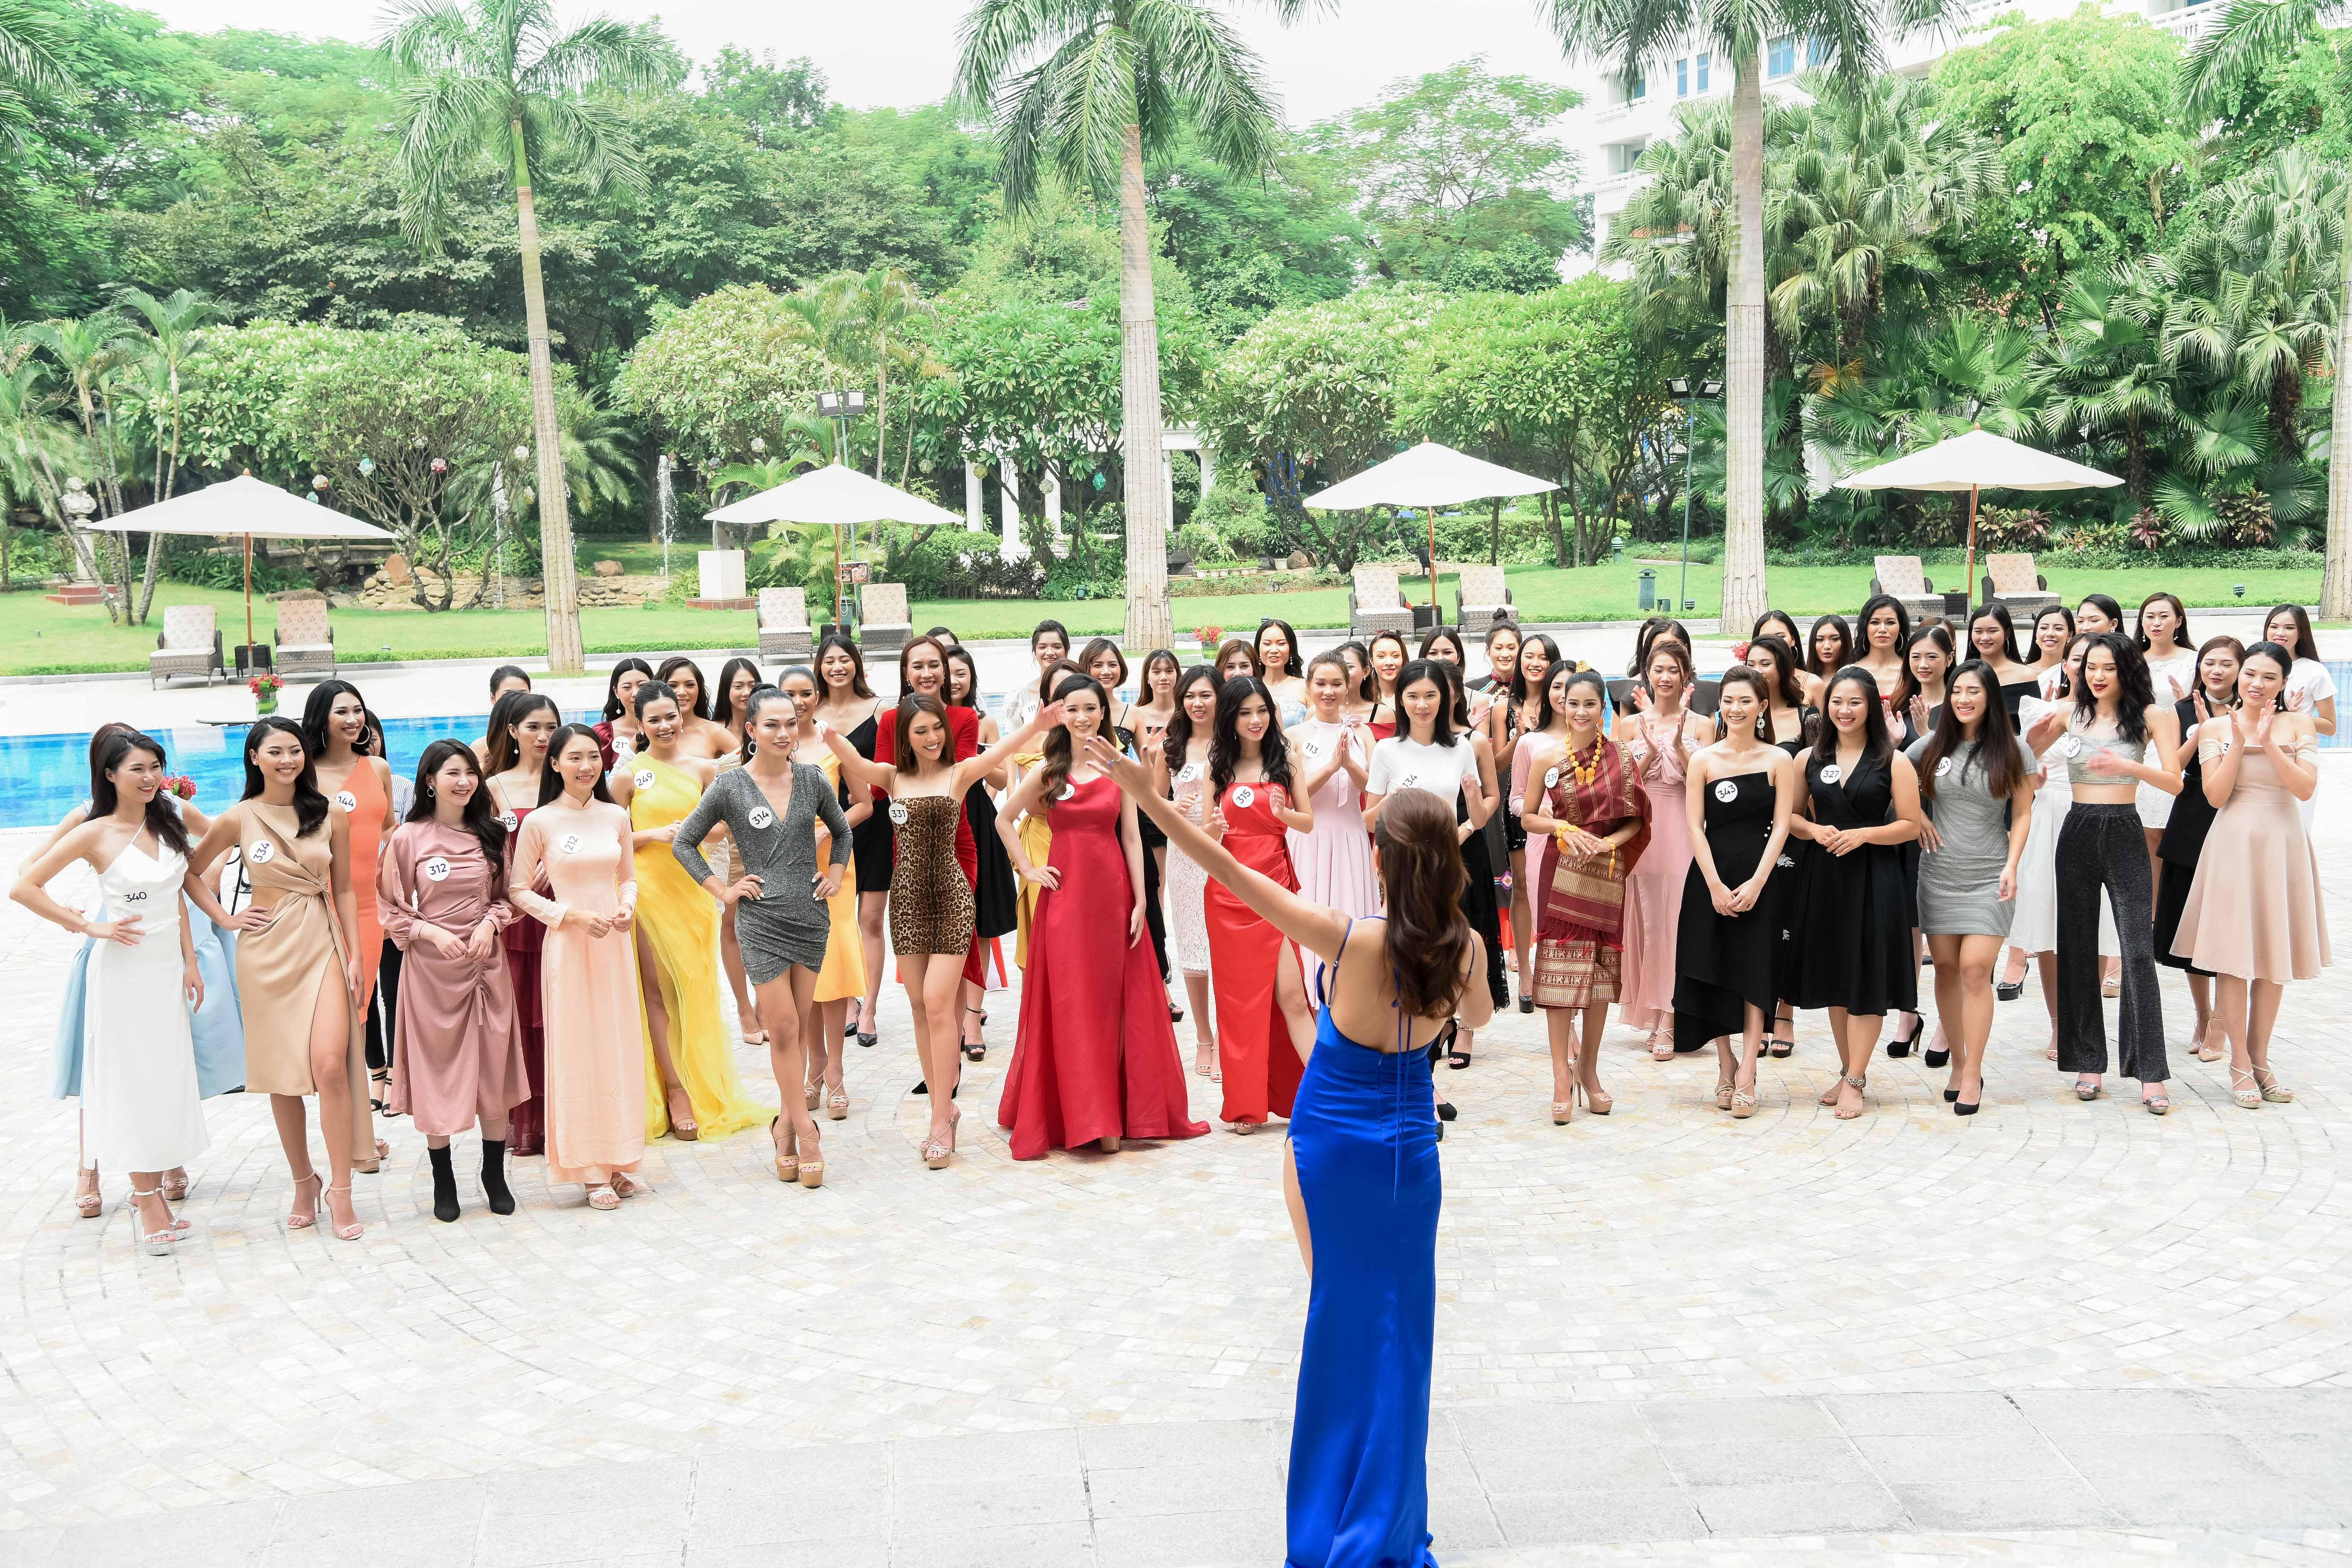 Thi sinh so khao phia Bac HHHVVN 2019 (36)